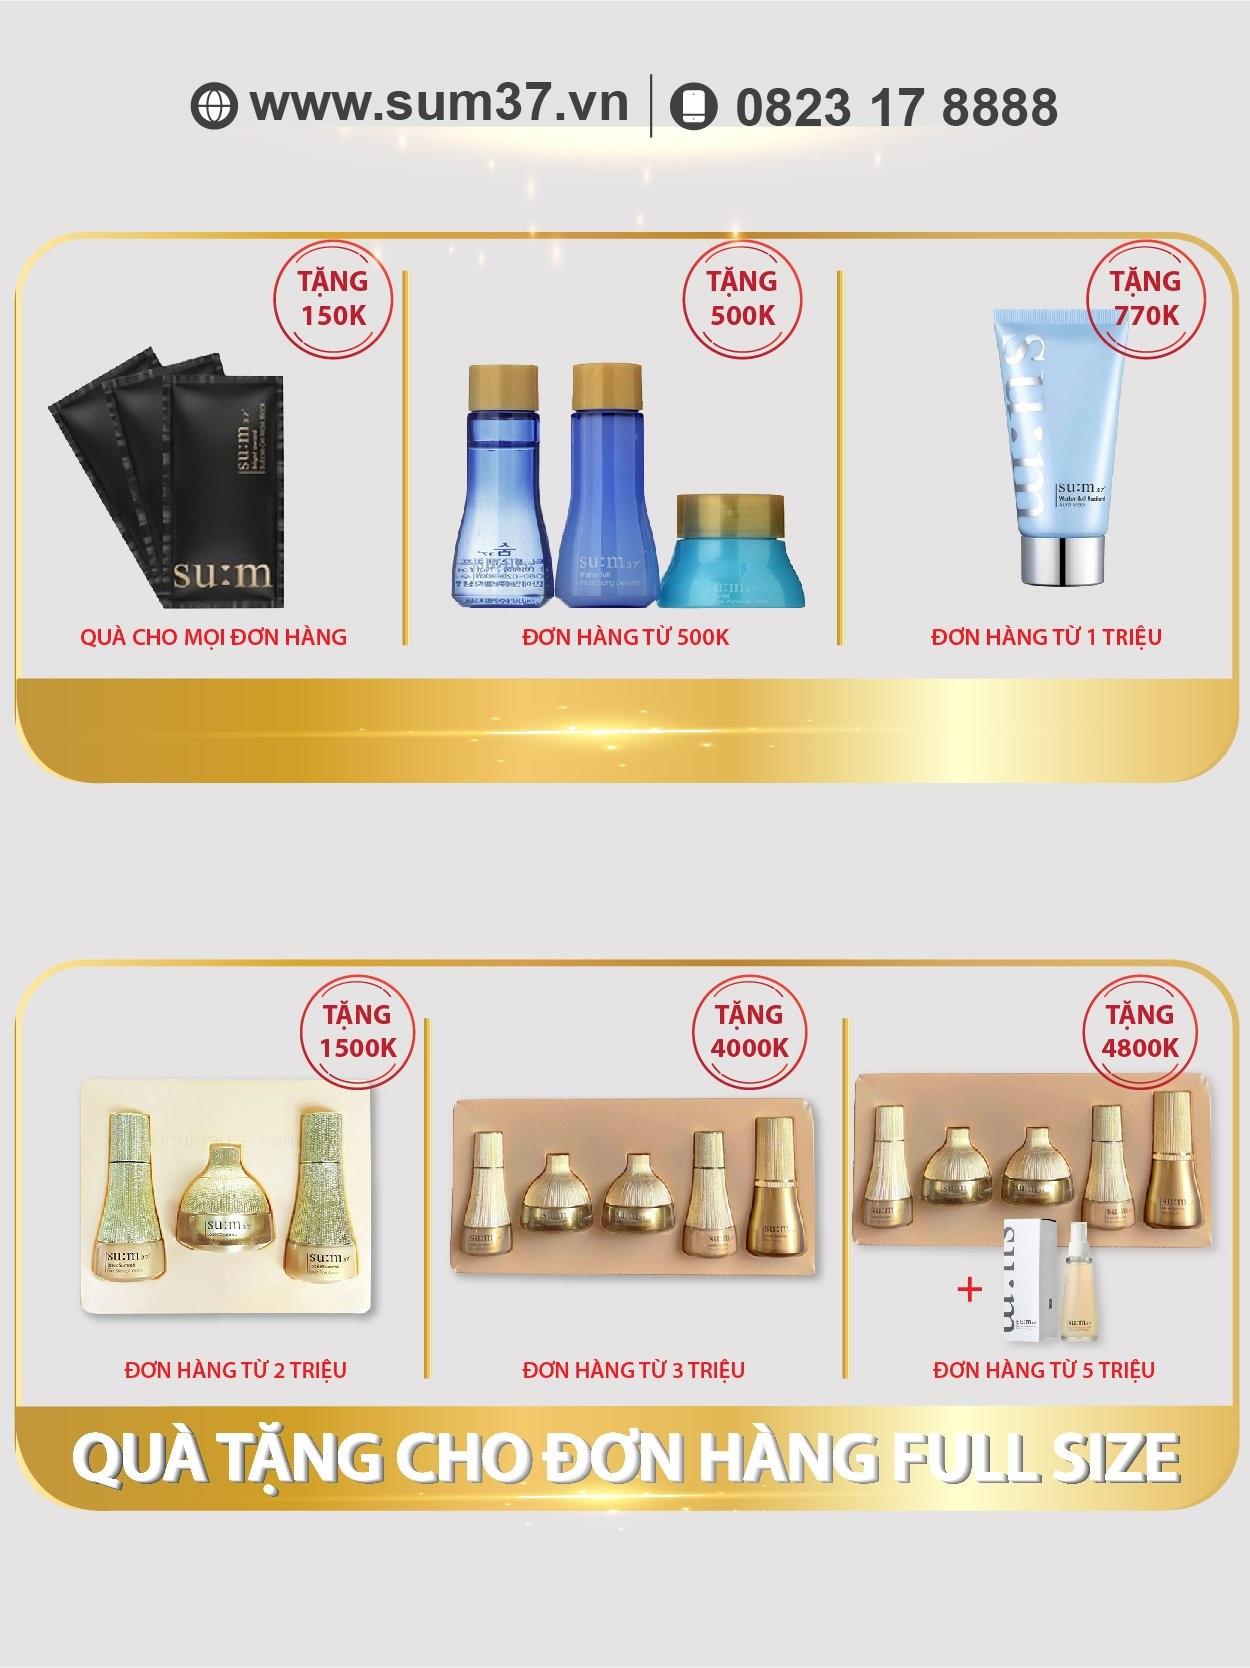 Nước hoa hồng Sum37 Losec Summa Elixir Skin Softener bổ sung ẩm